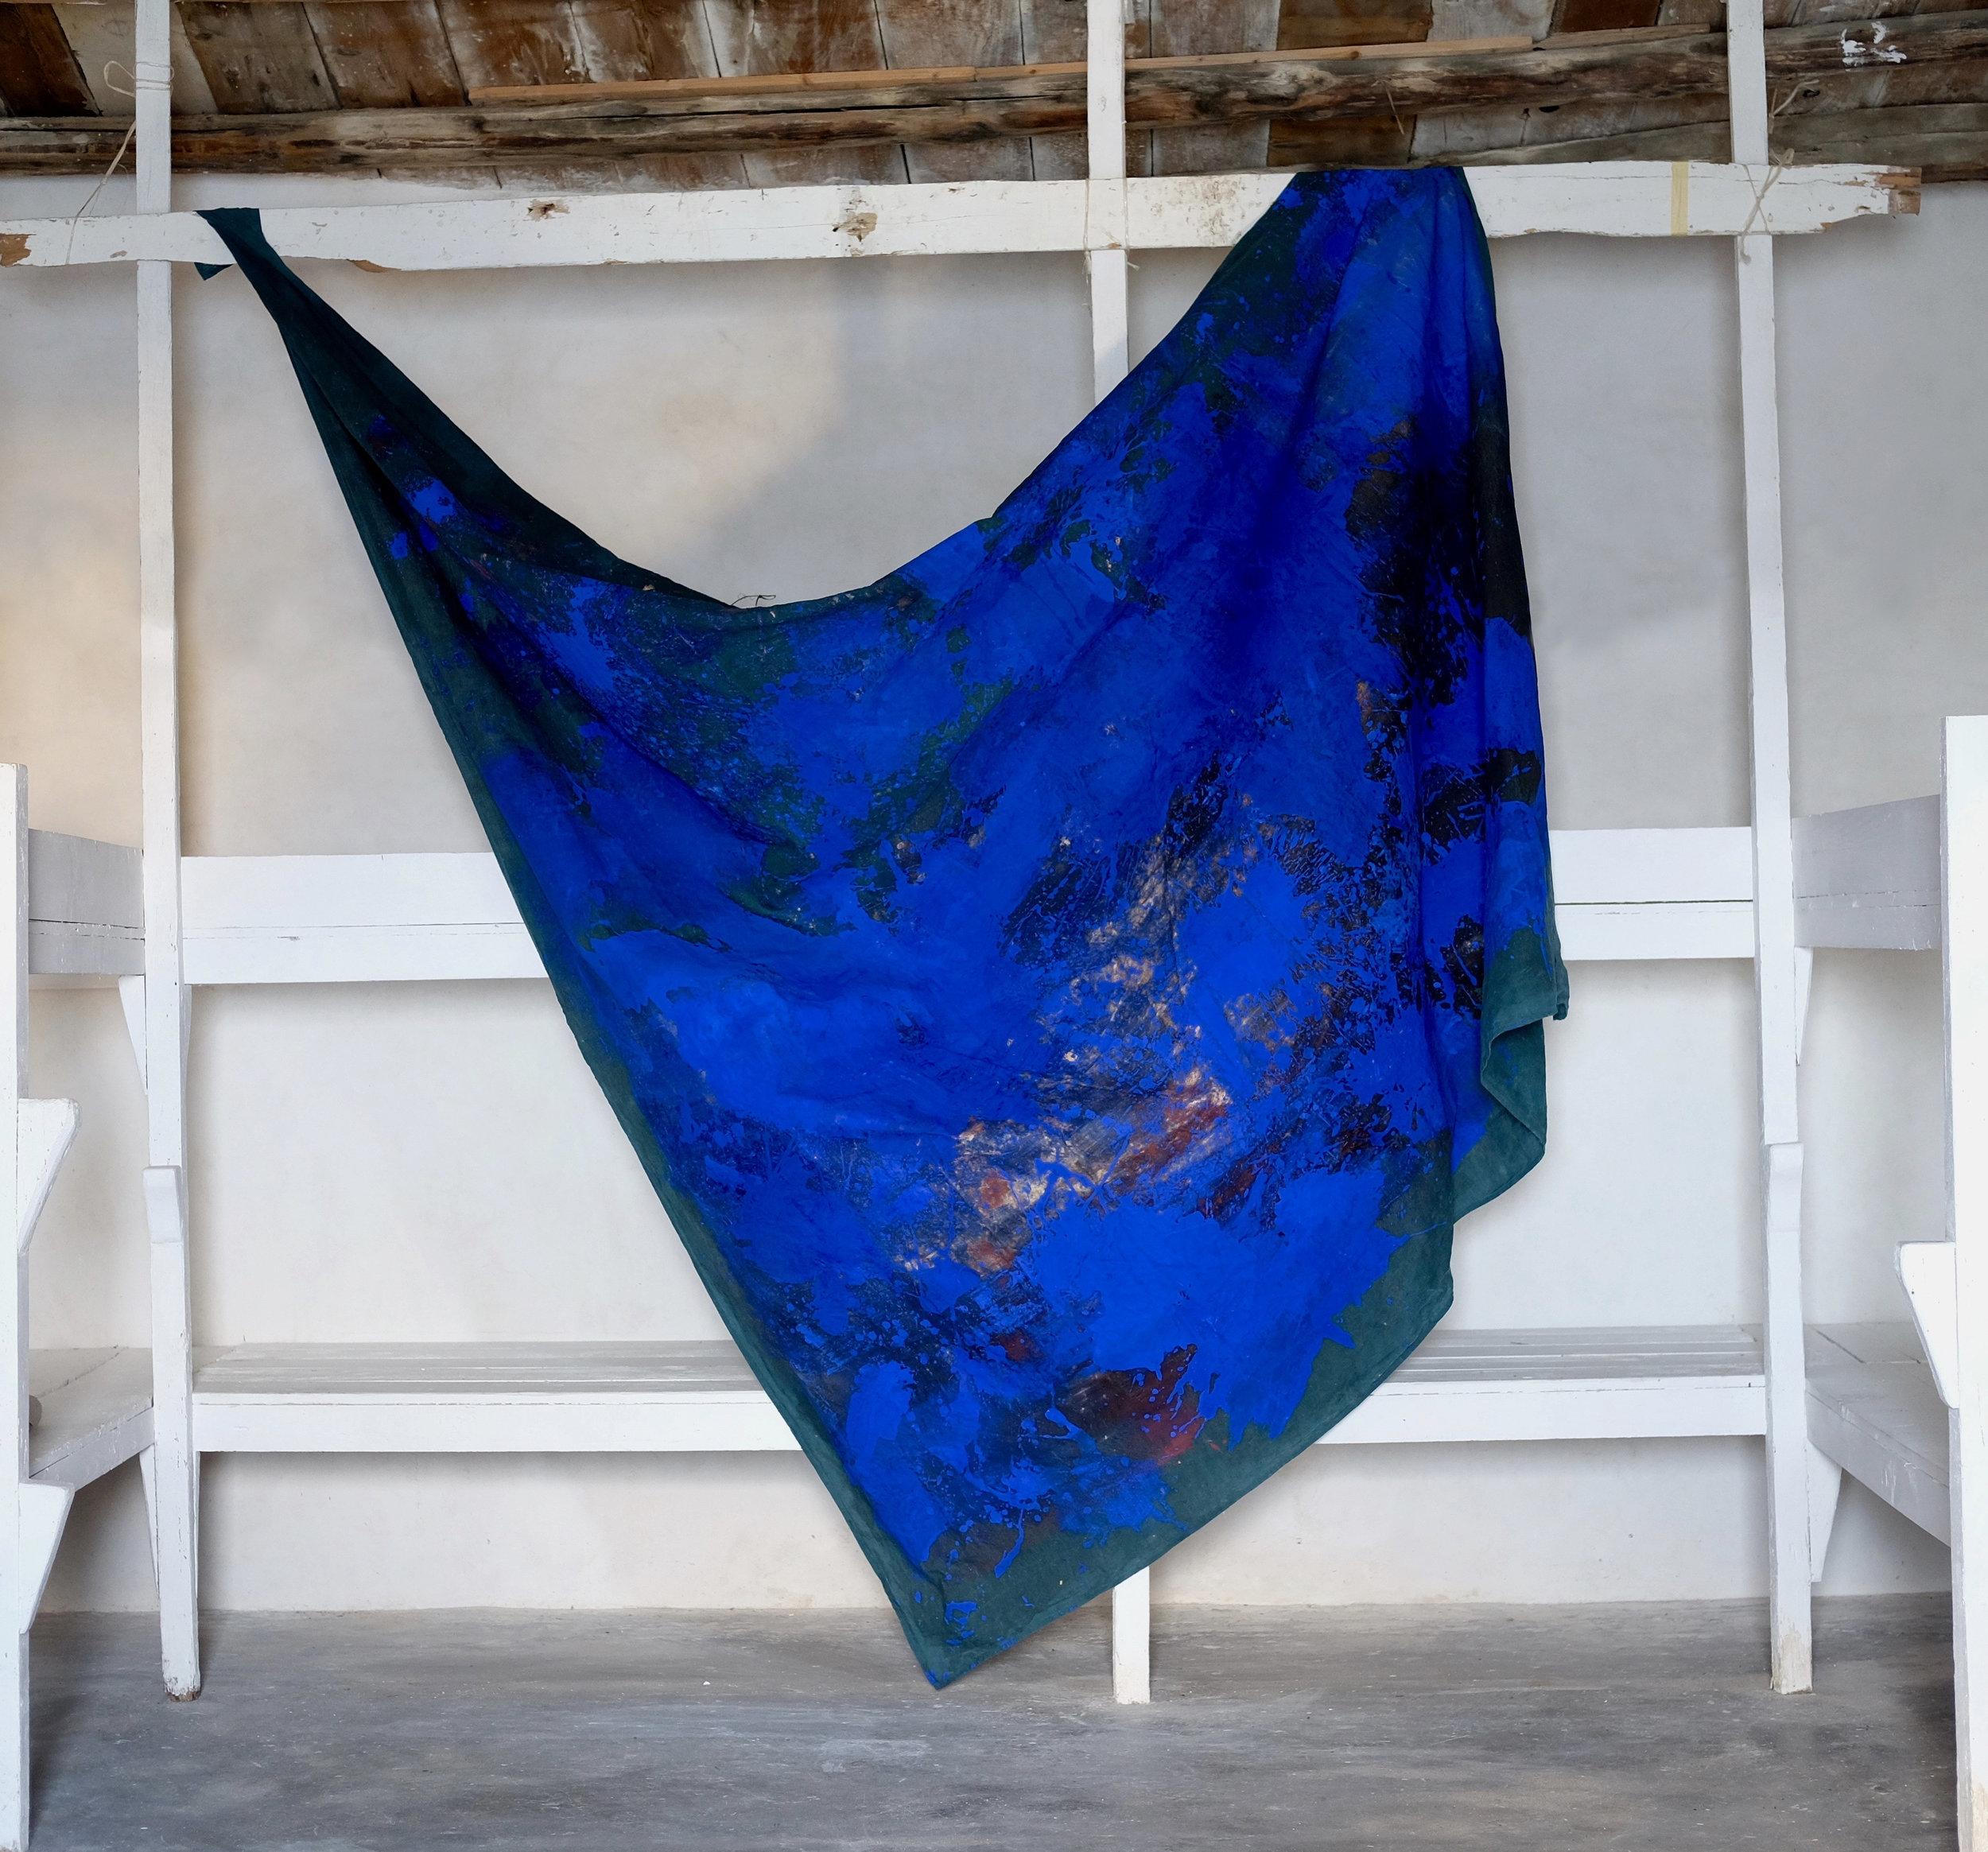 Janvier 2019, 310x270 cm, mixed medias on free linen canvas